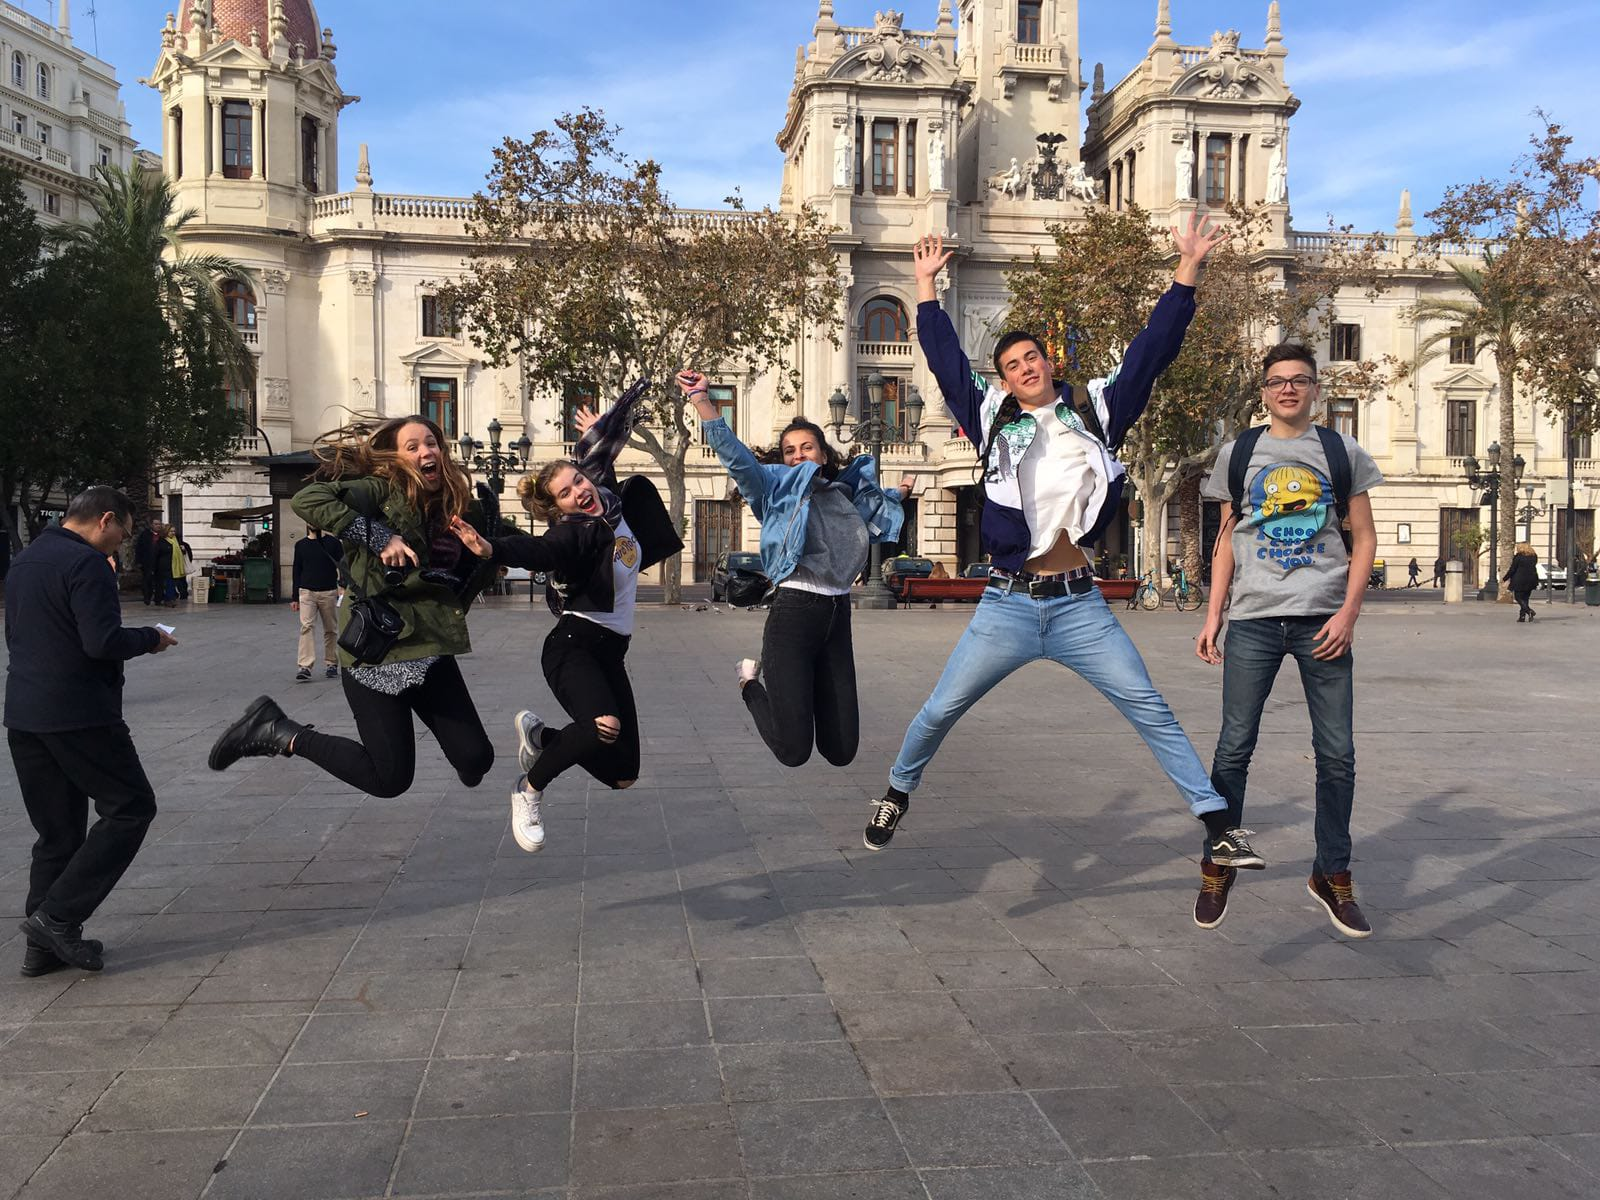 Austauschschüler in Alicante